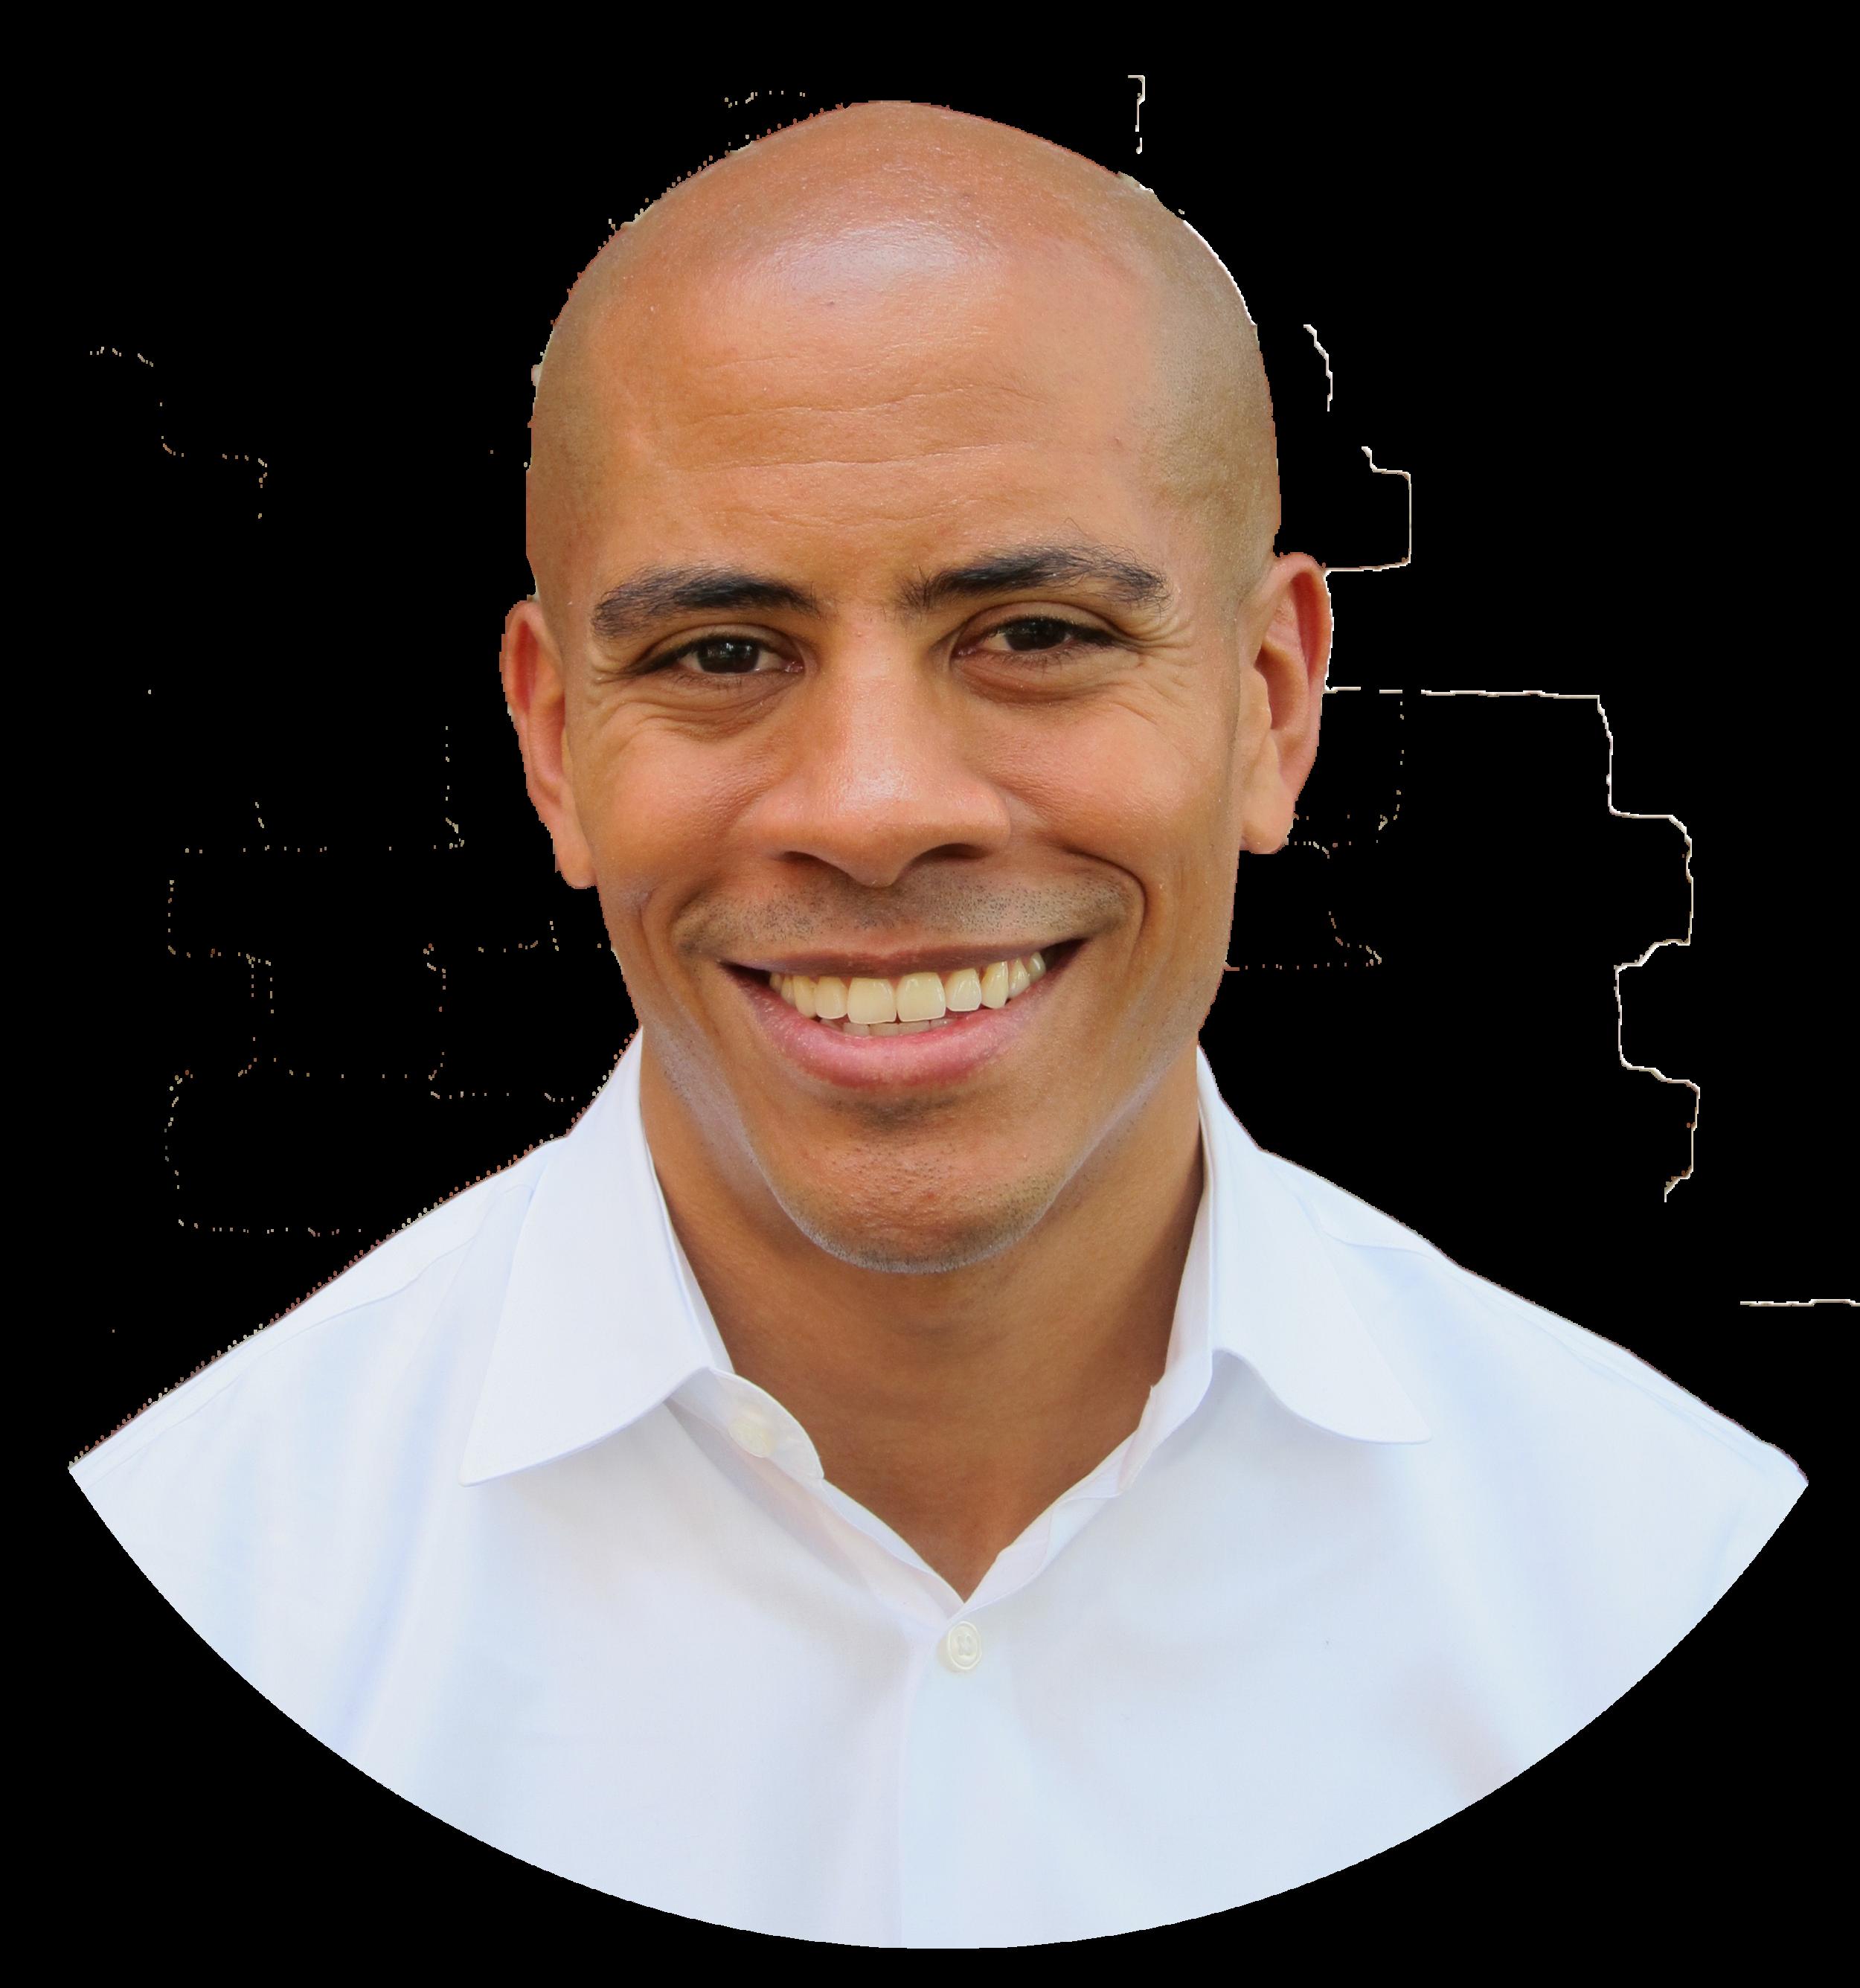 Sebastian Giwa, PhD, MBA - Co-Founder & Executive Chairman, Elevian